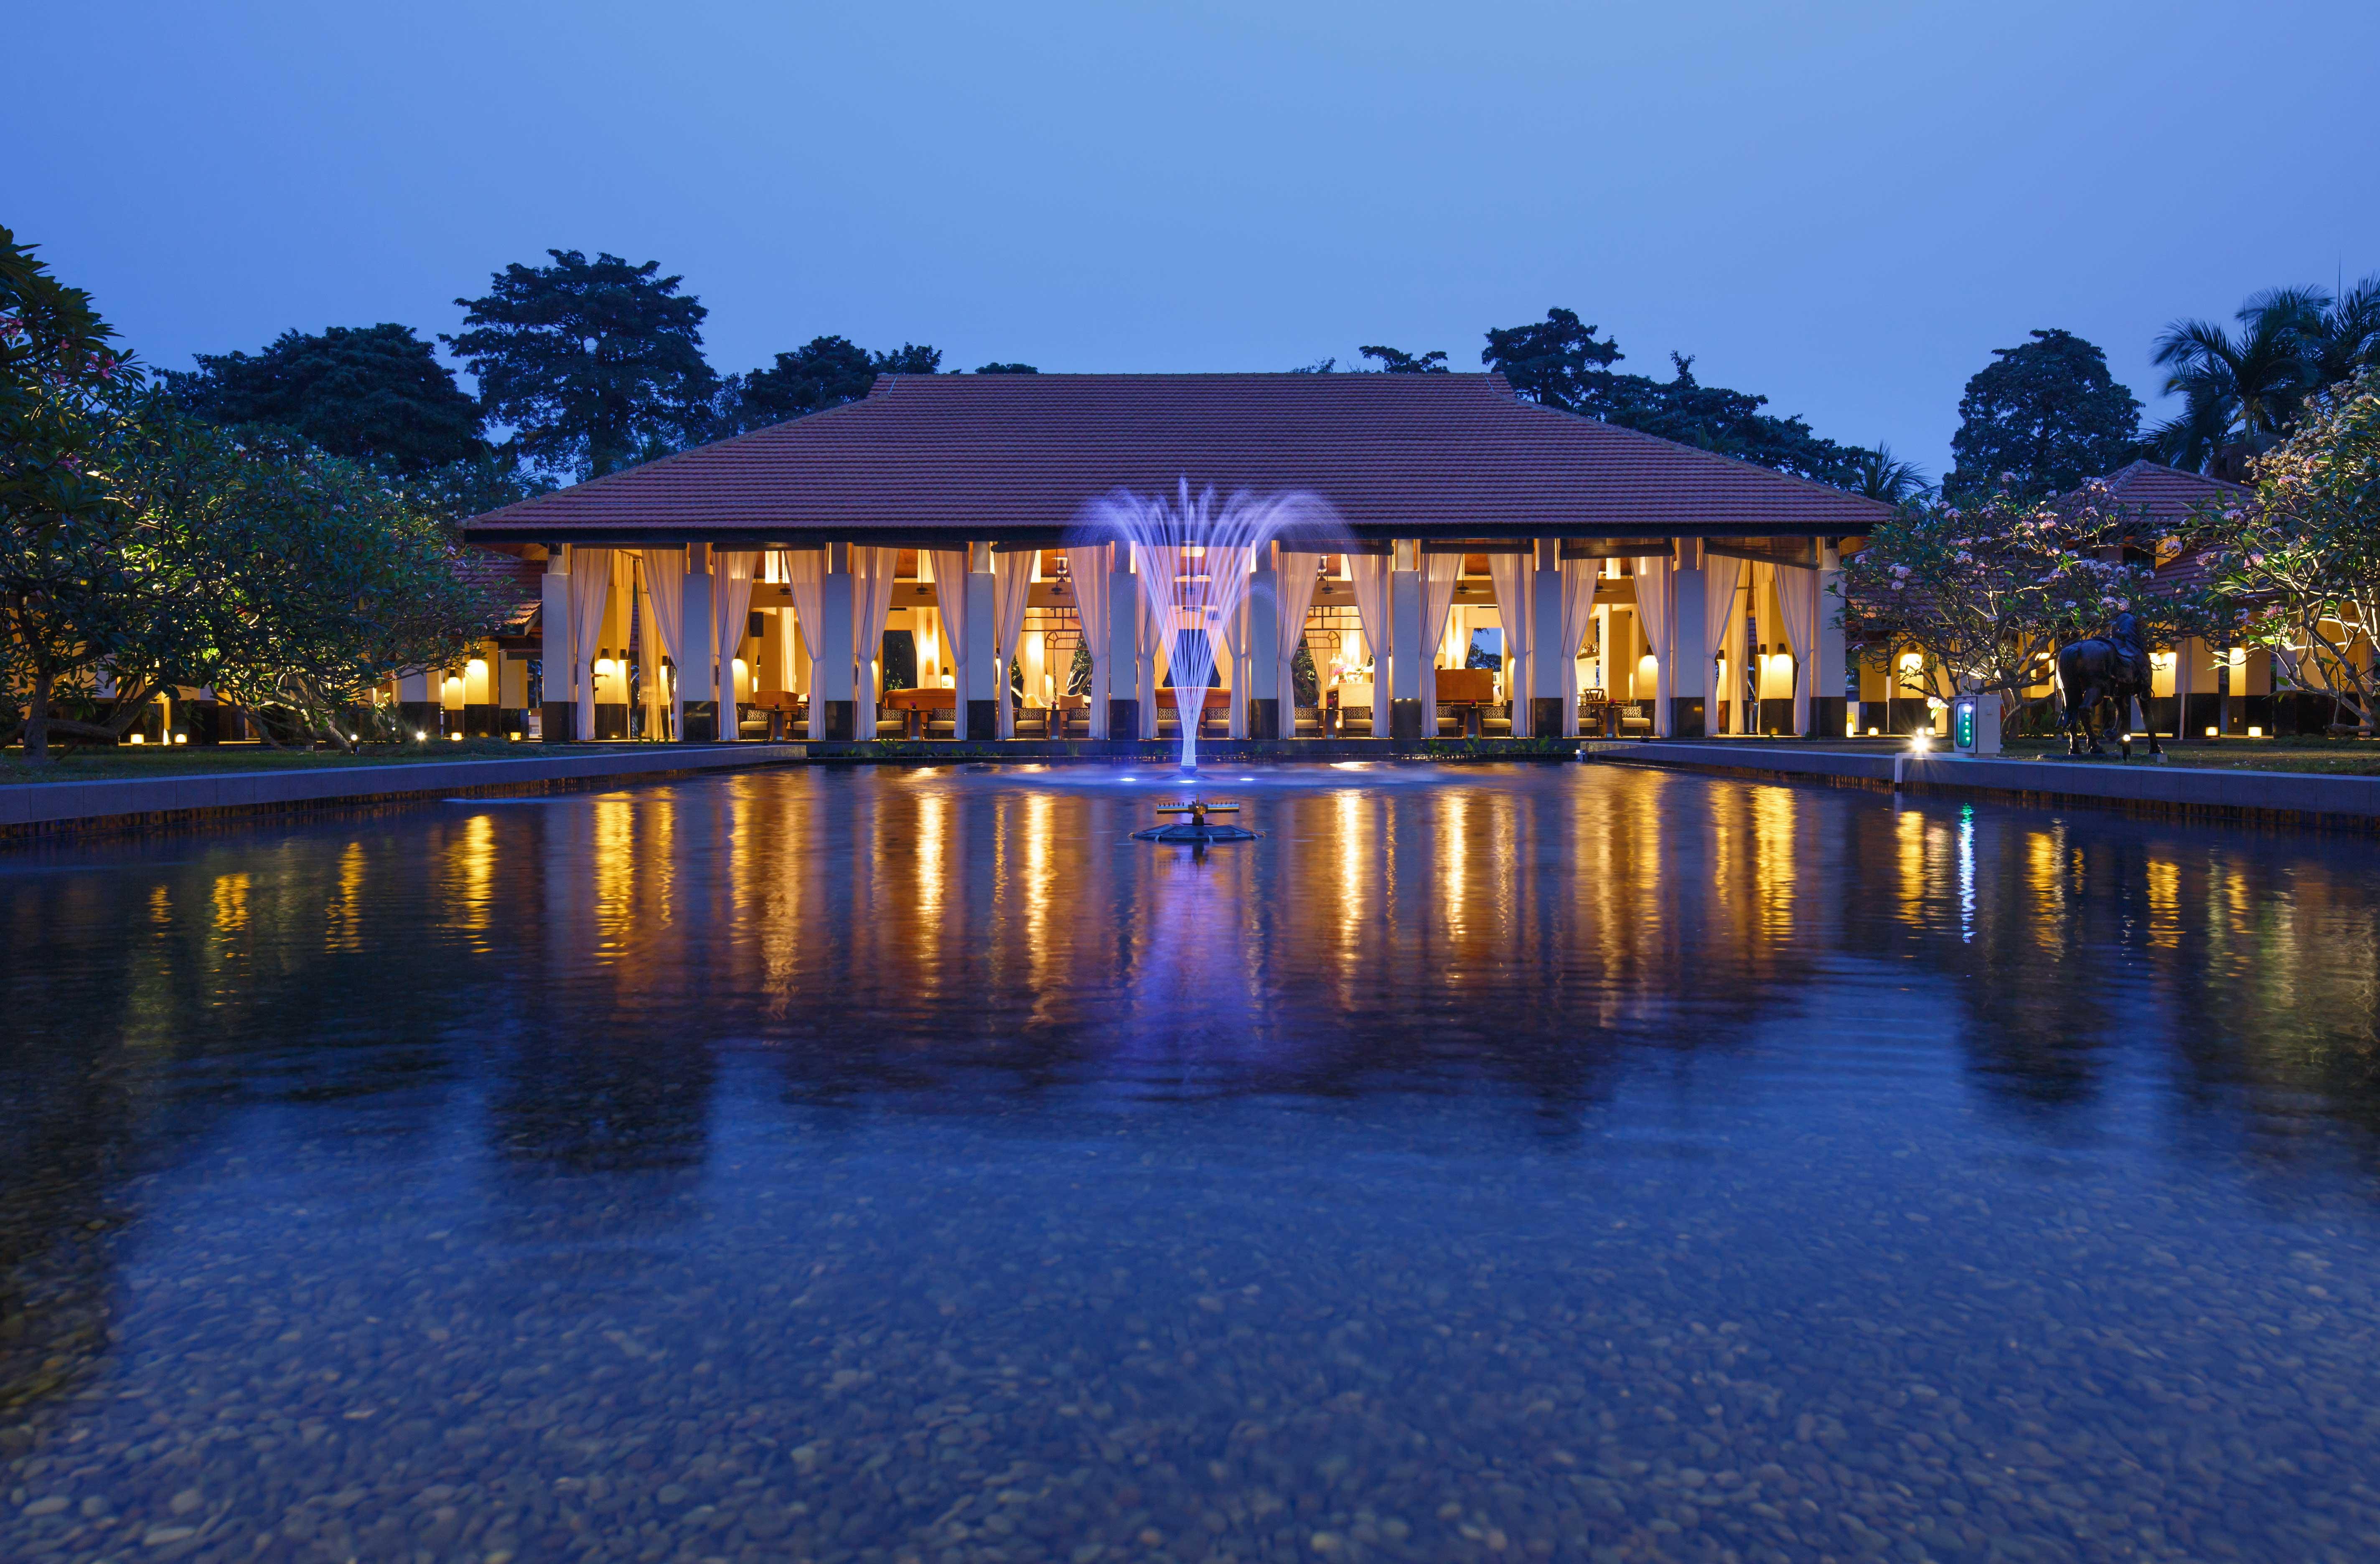 Sofitel-Singapore-Sentosa-Resort-Spa-venuerific-blog-lebar-fountain